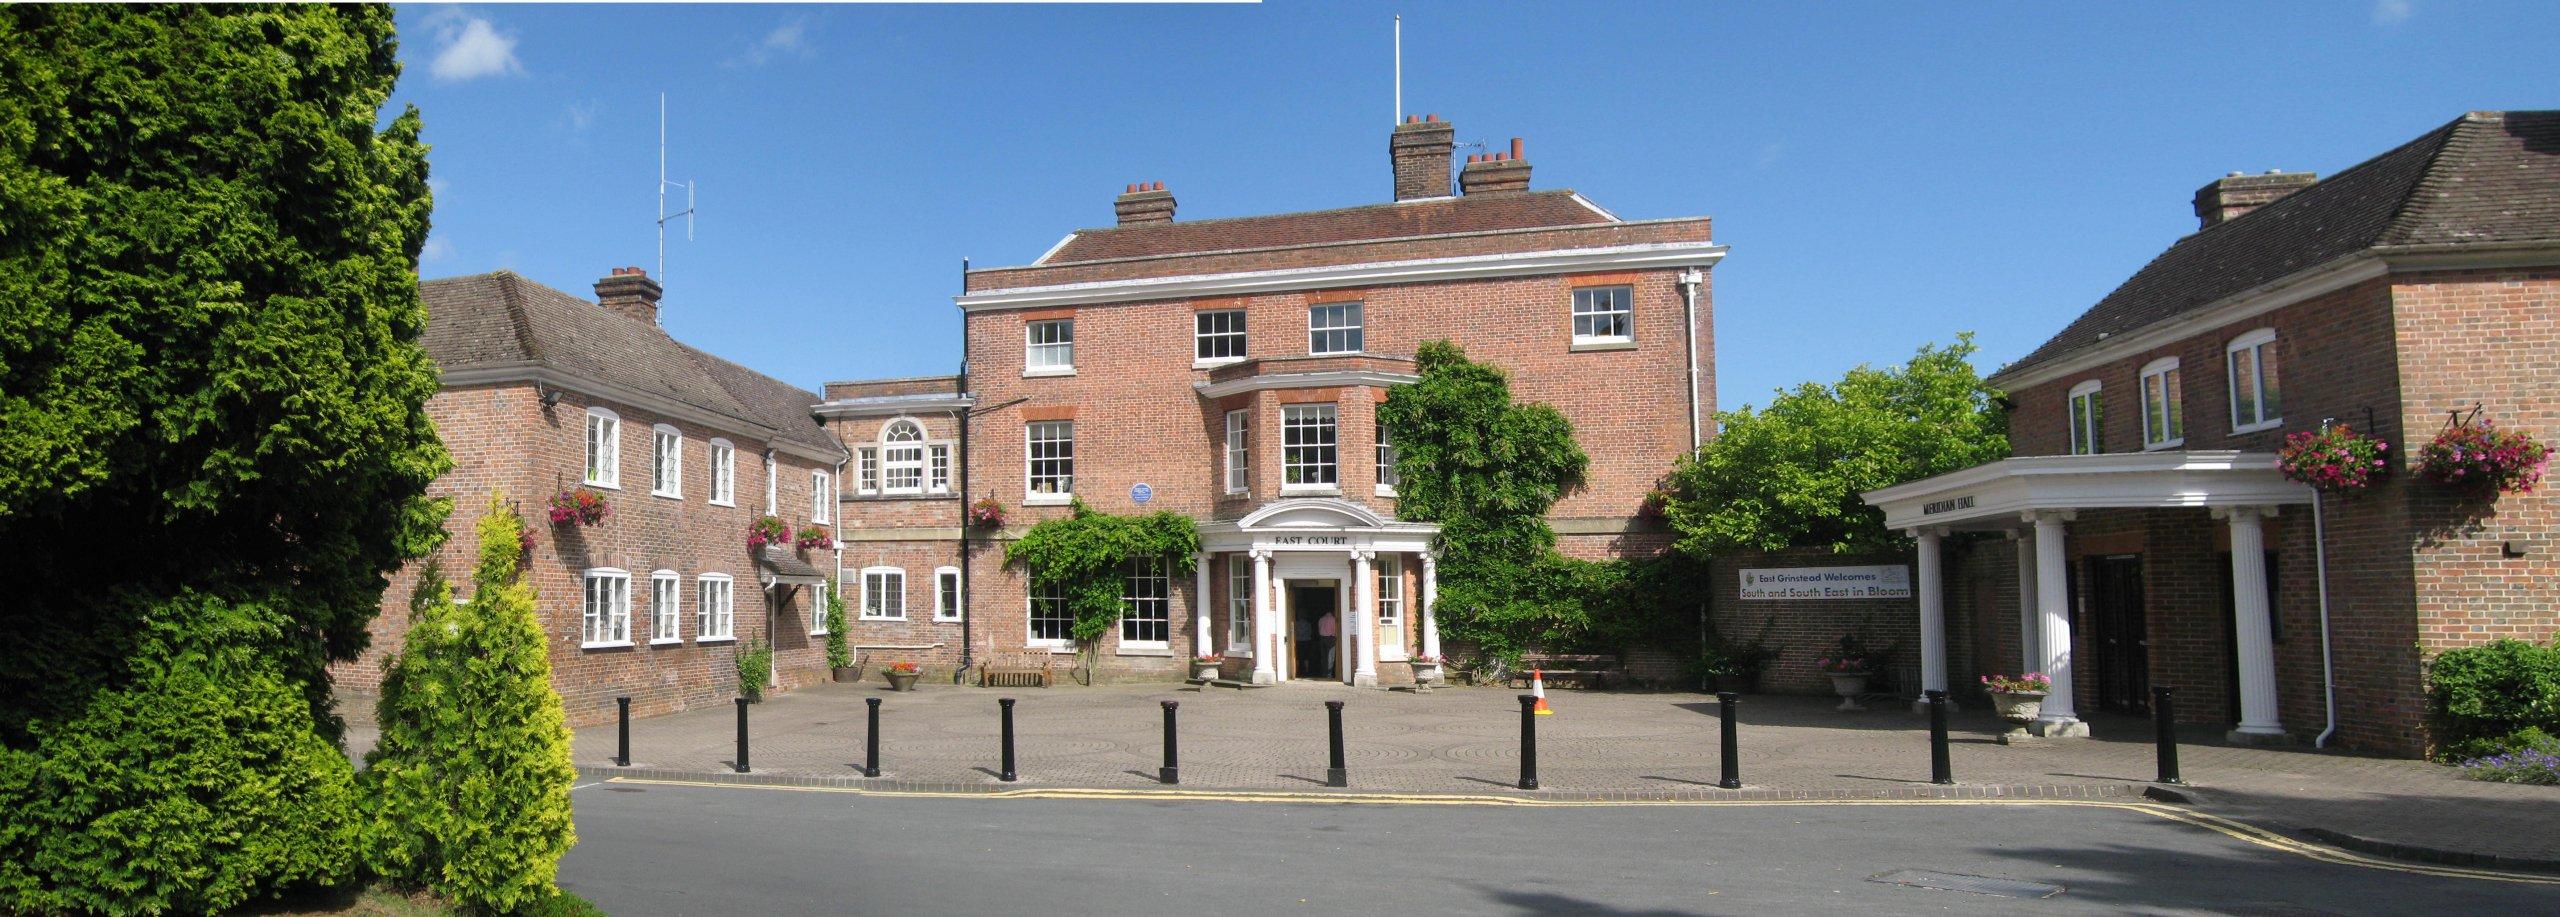 East Court Mansion